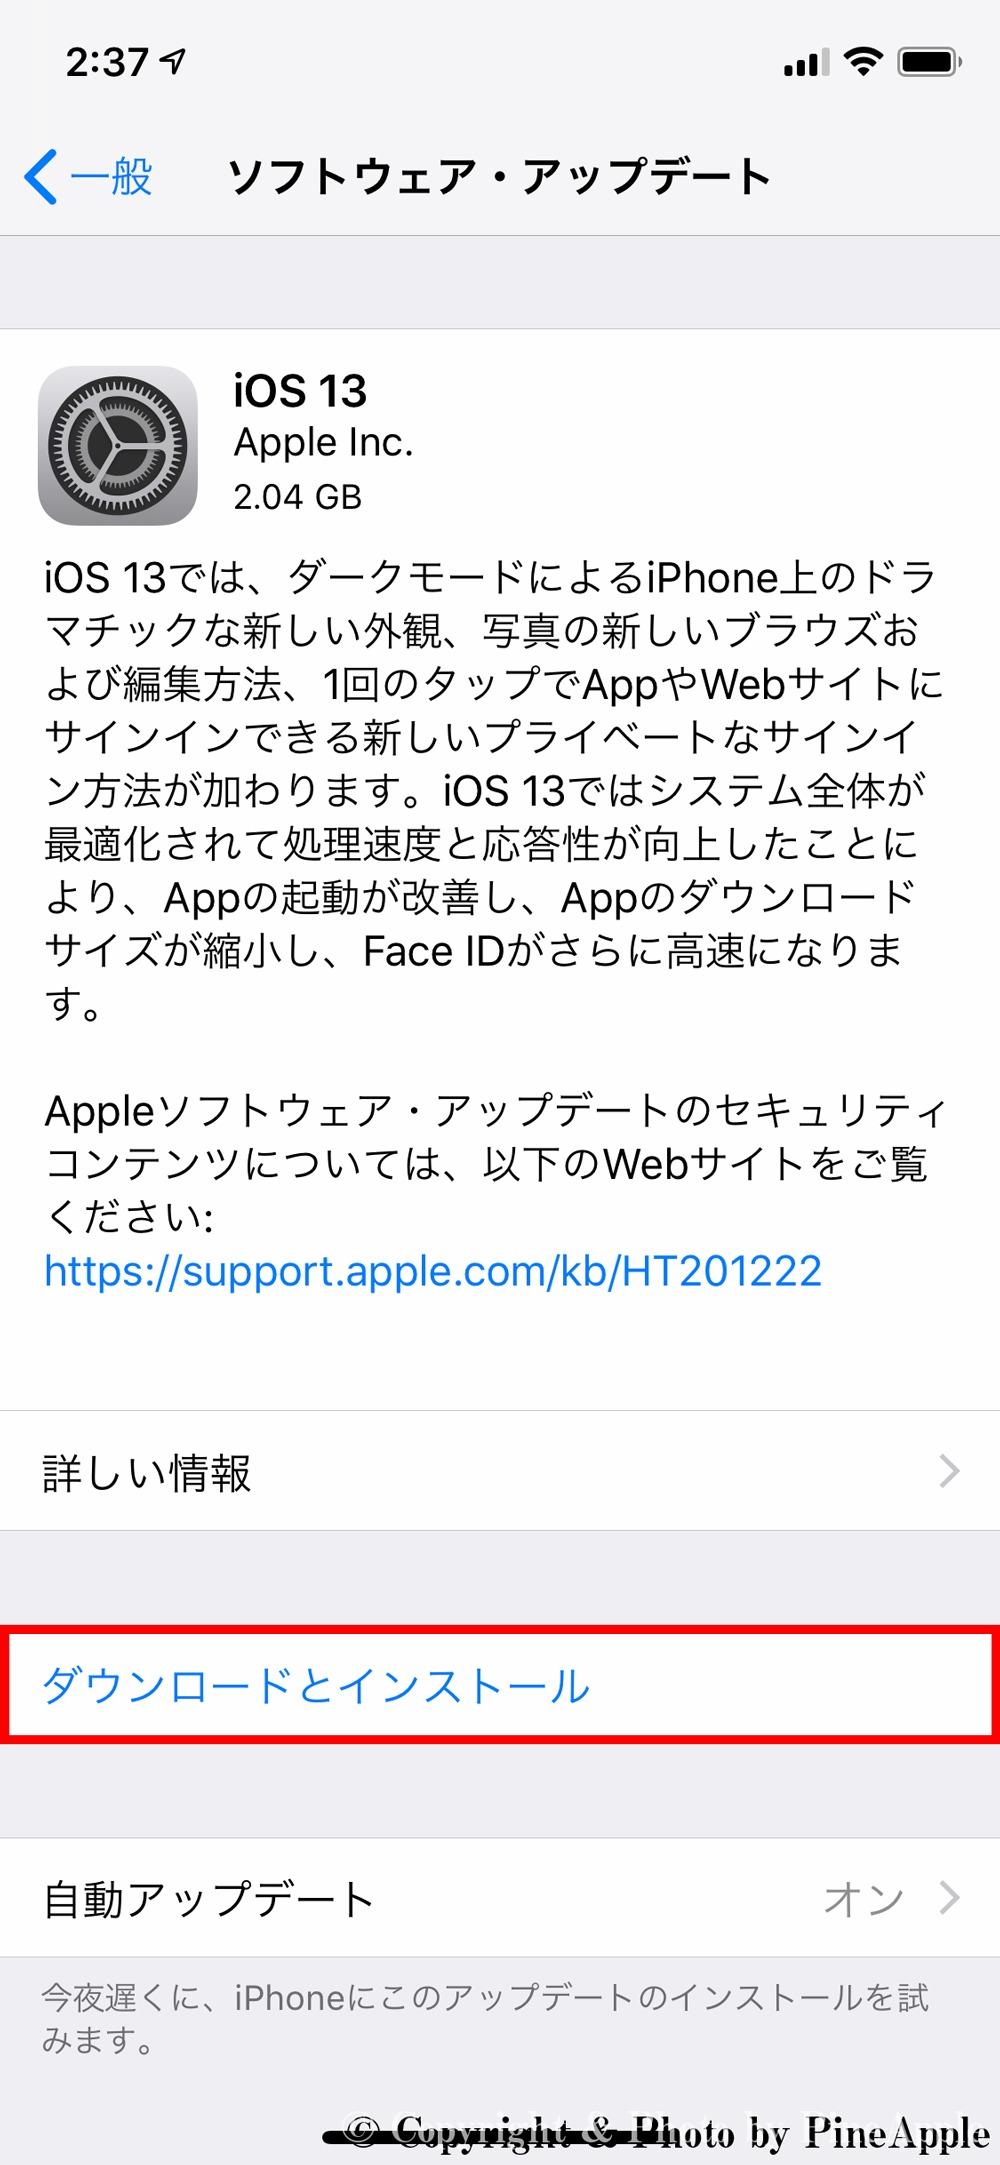 iOS 13:設定>一般>ソフトウェアアップデート